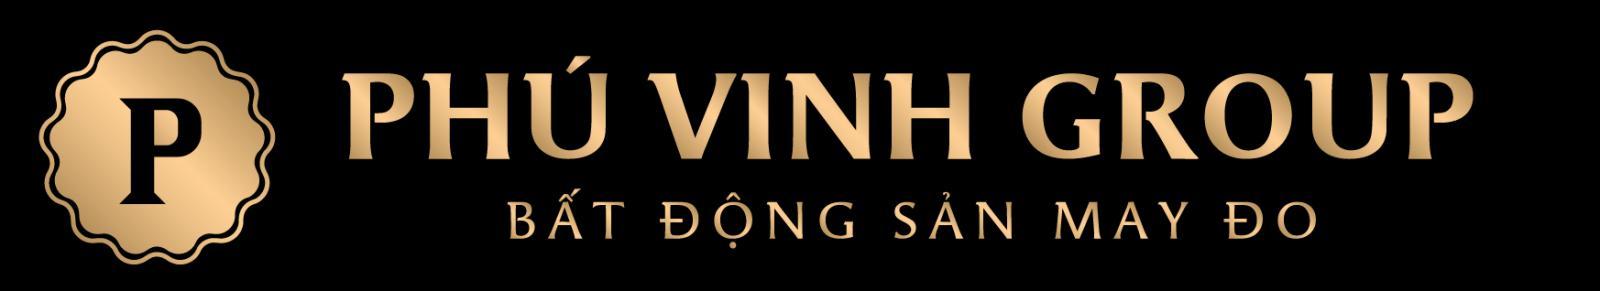 Phú Vinh Group